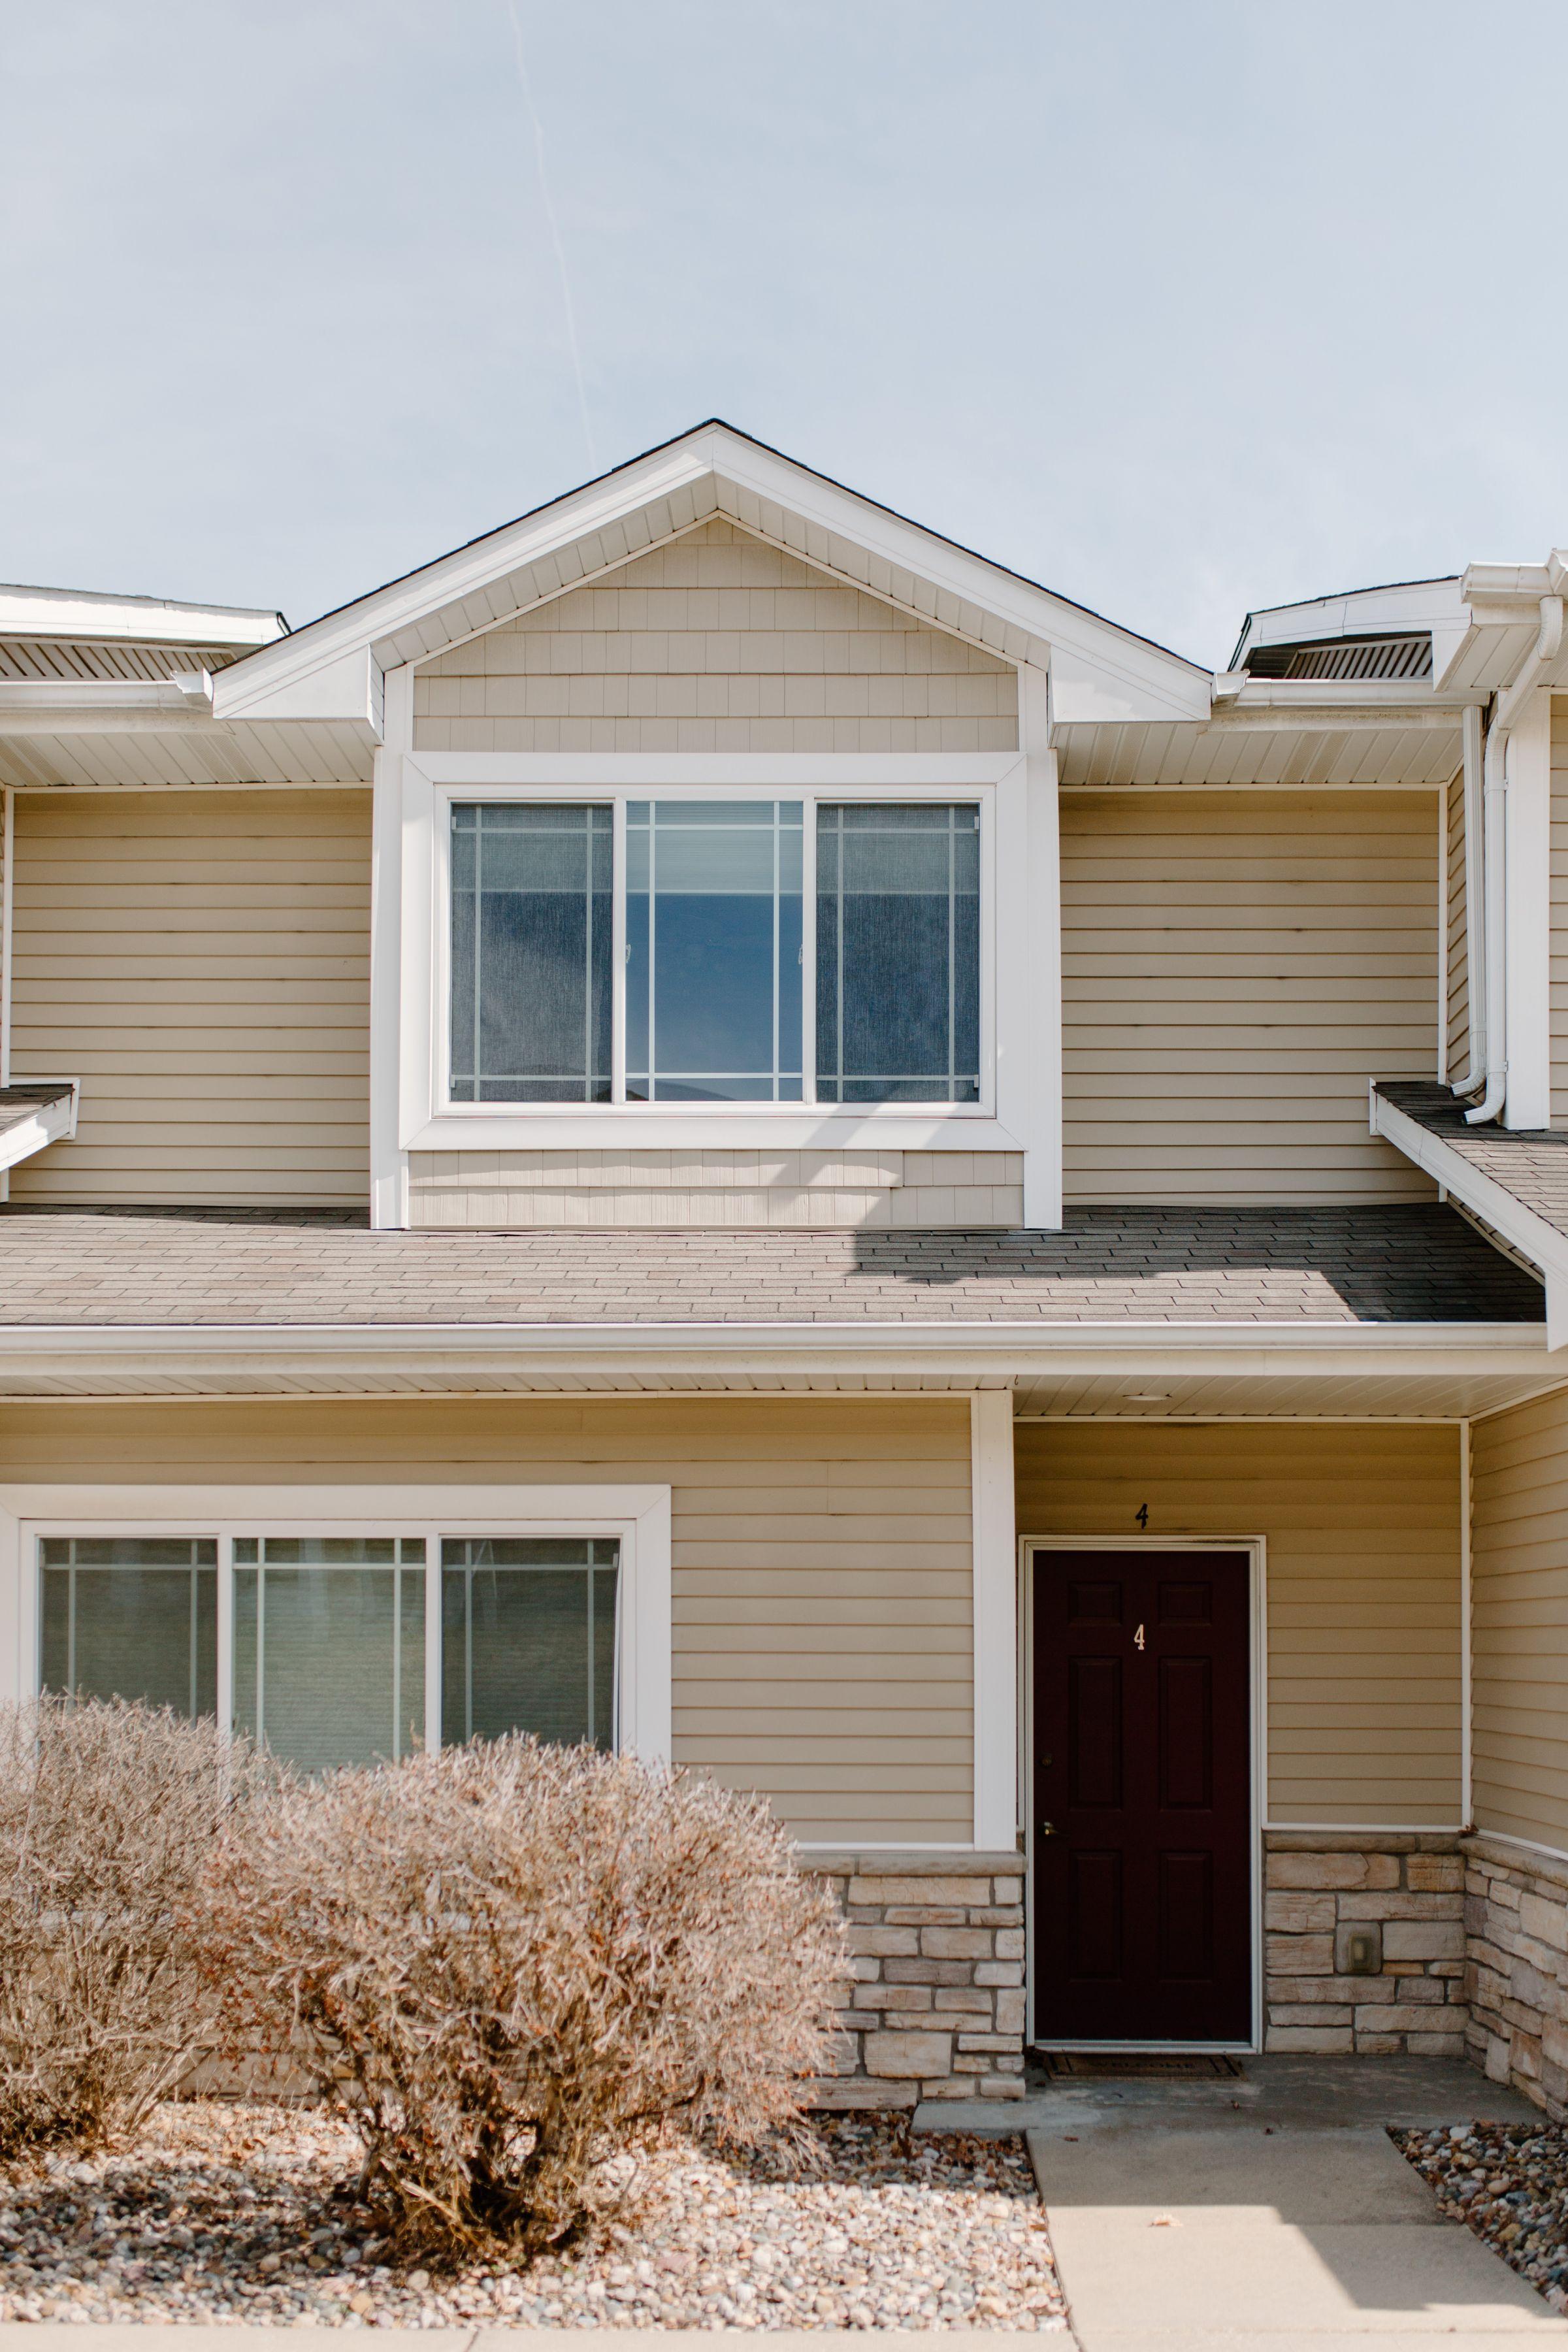 residential-polk-county-iowa-0-acres-listing-number-15418-3-2021-03-22-162129.jpg